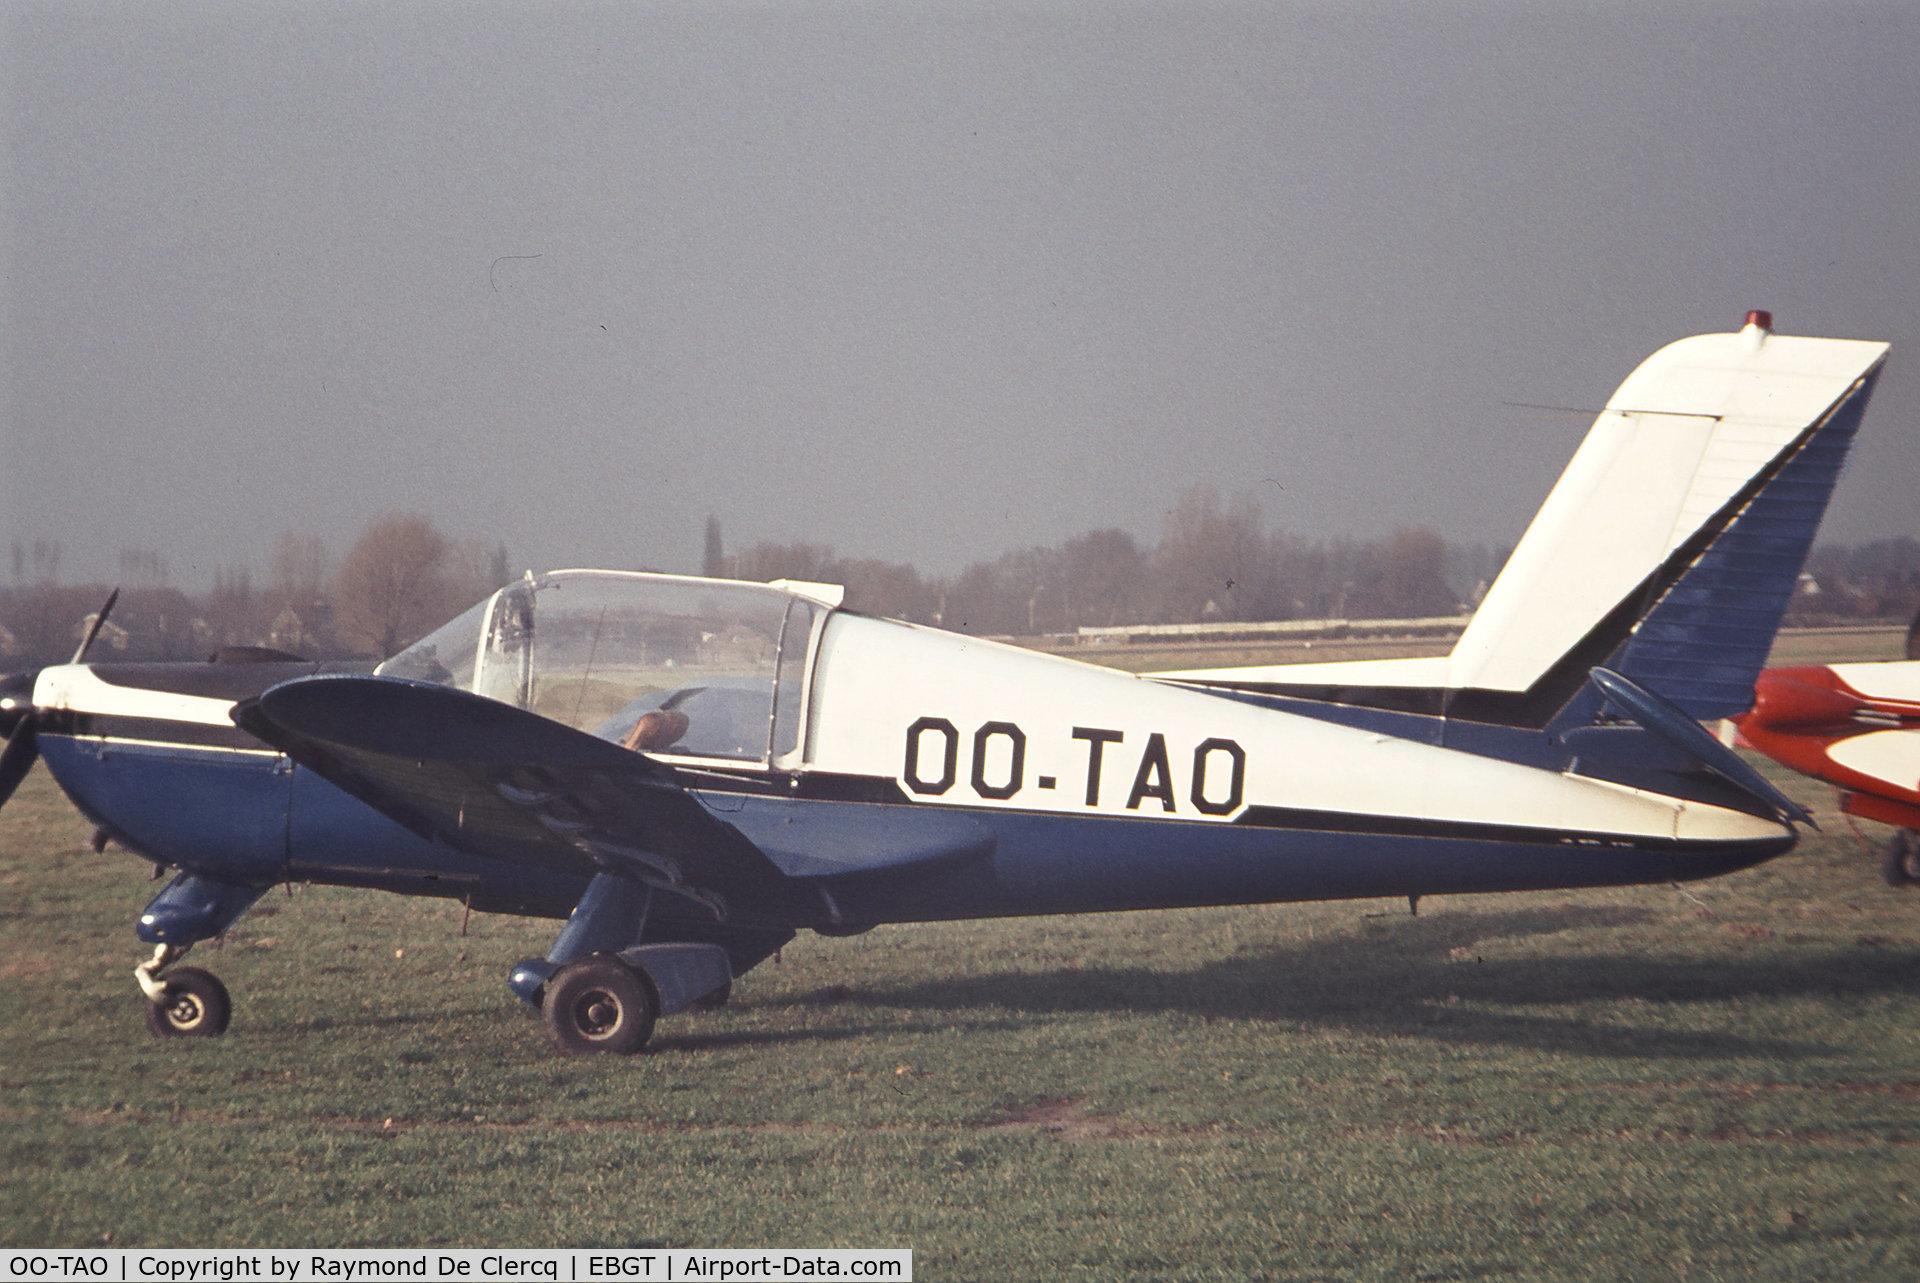 OO-TAO, Morane-Saulnier MS-892A Rallye Commodore 150 C/N 10457, At Ghent airport in 1970's.